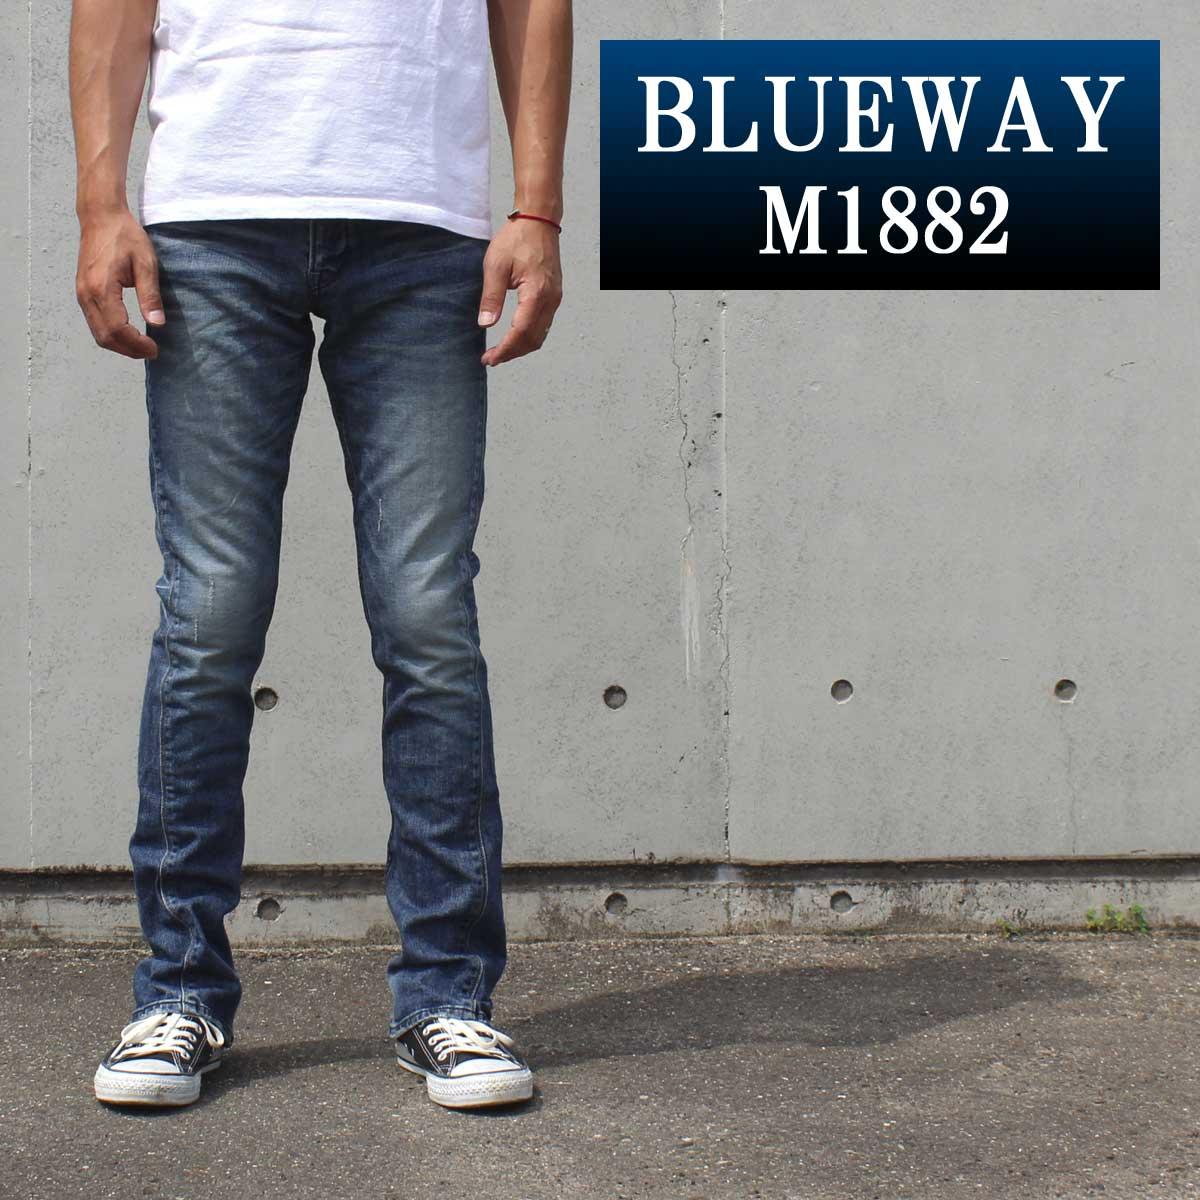 Blueway Solid Stretch Denim Semi Bootcut Jeans Hard Vintage M1882 5504 Blue Way Jeans Men Denim Jeans Hemming